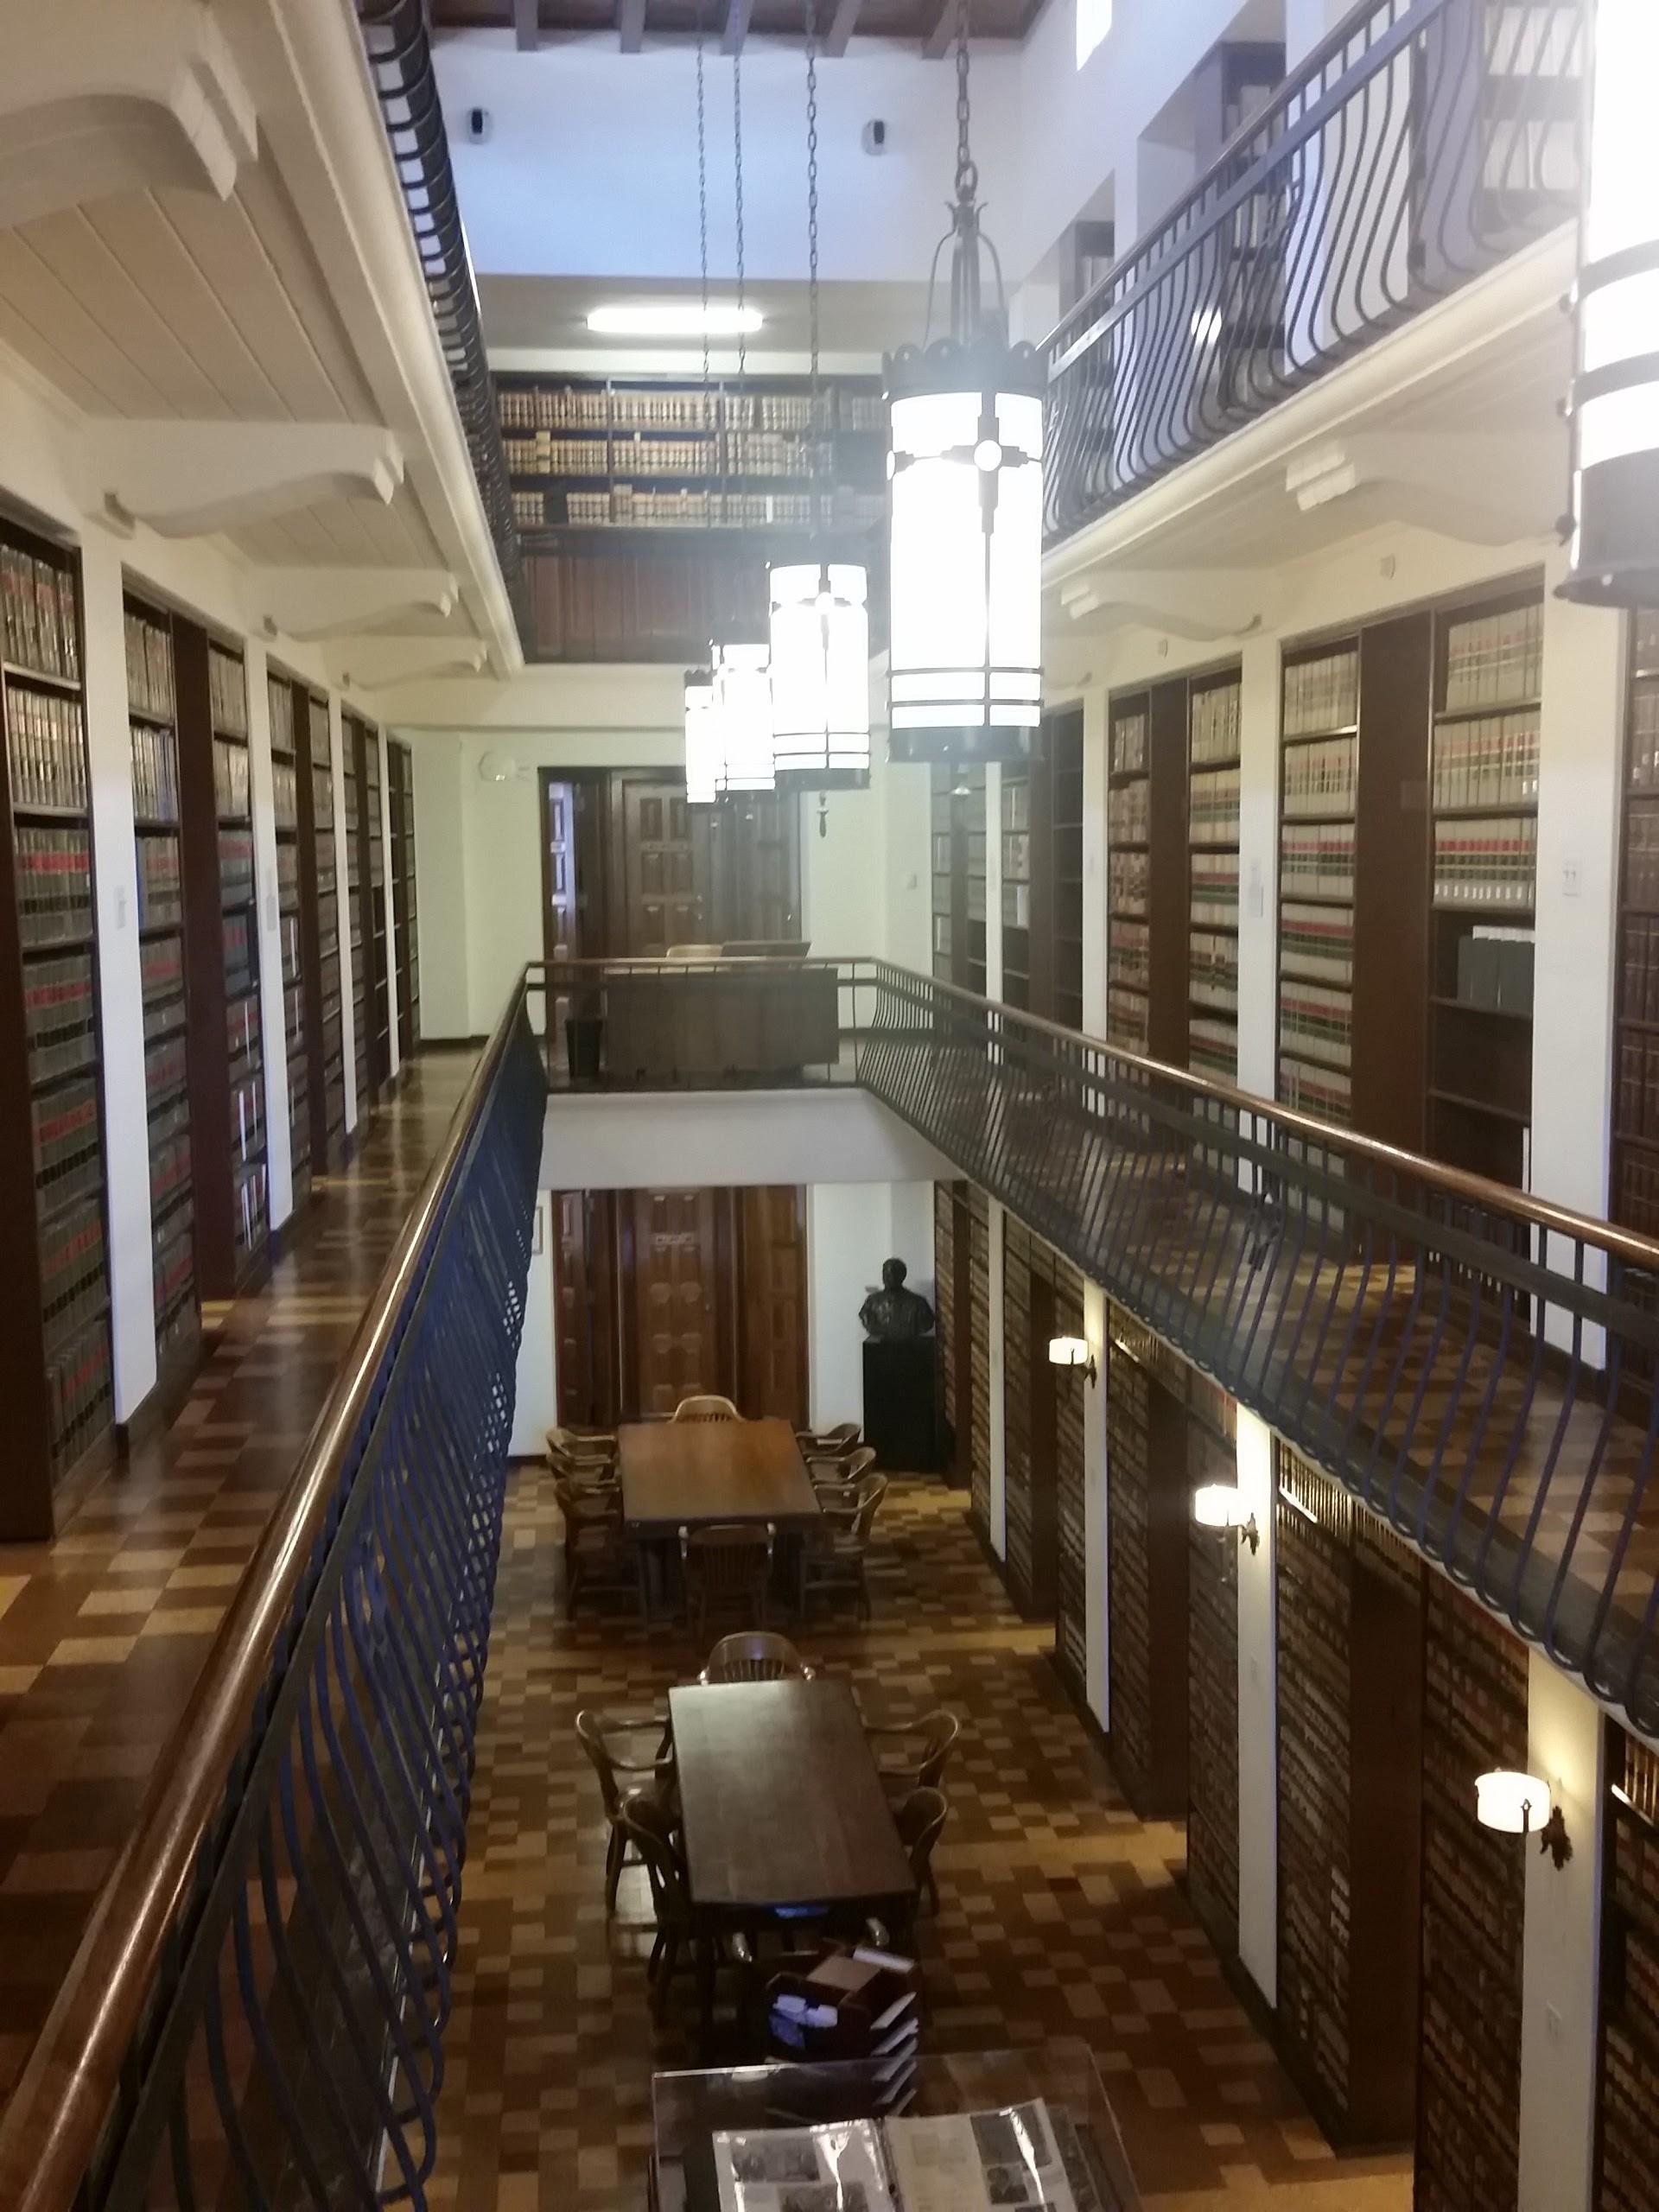 Atrium View of Library